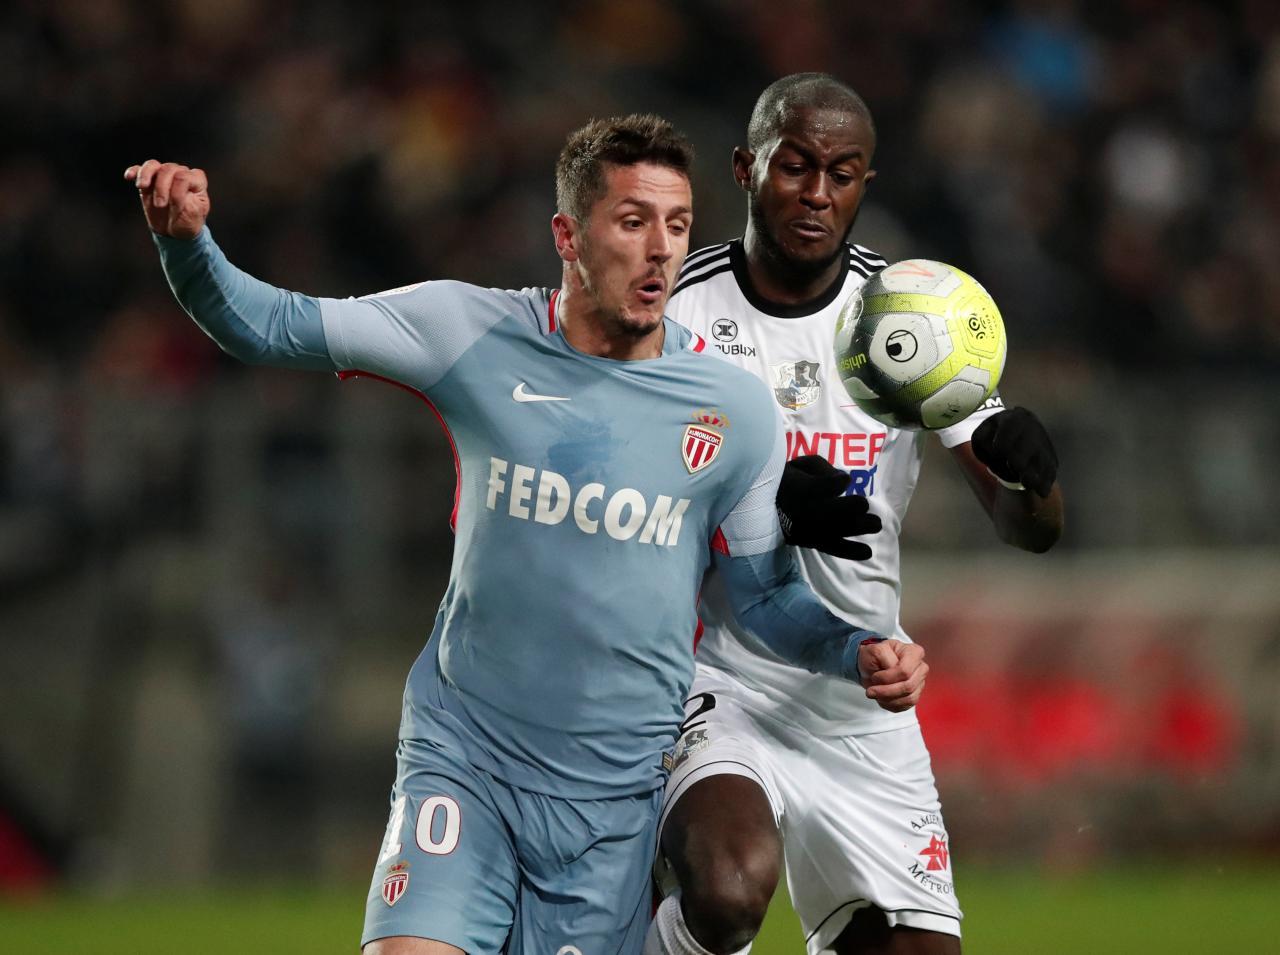 Ligue 1 - Amiens vs Monaco